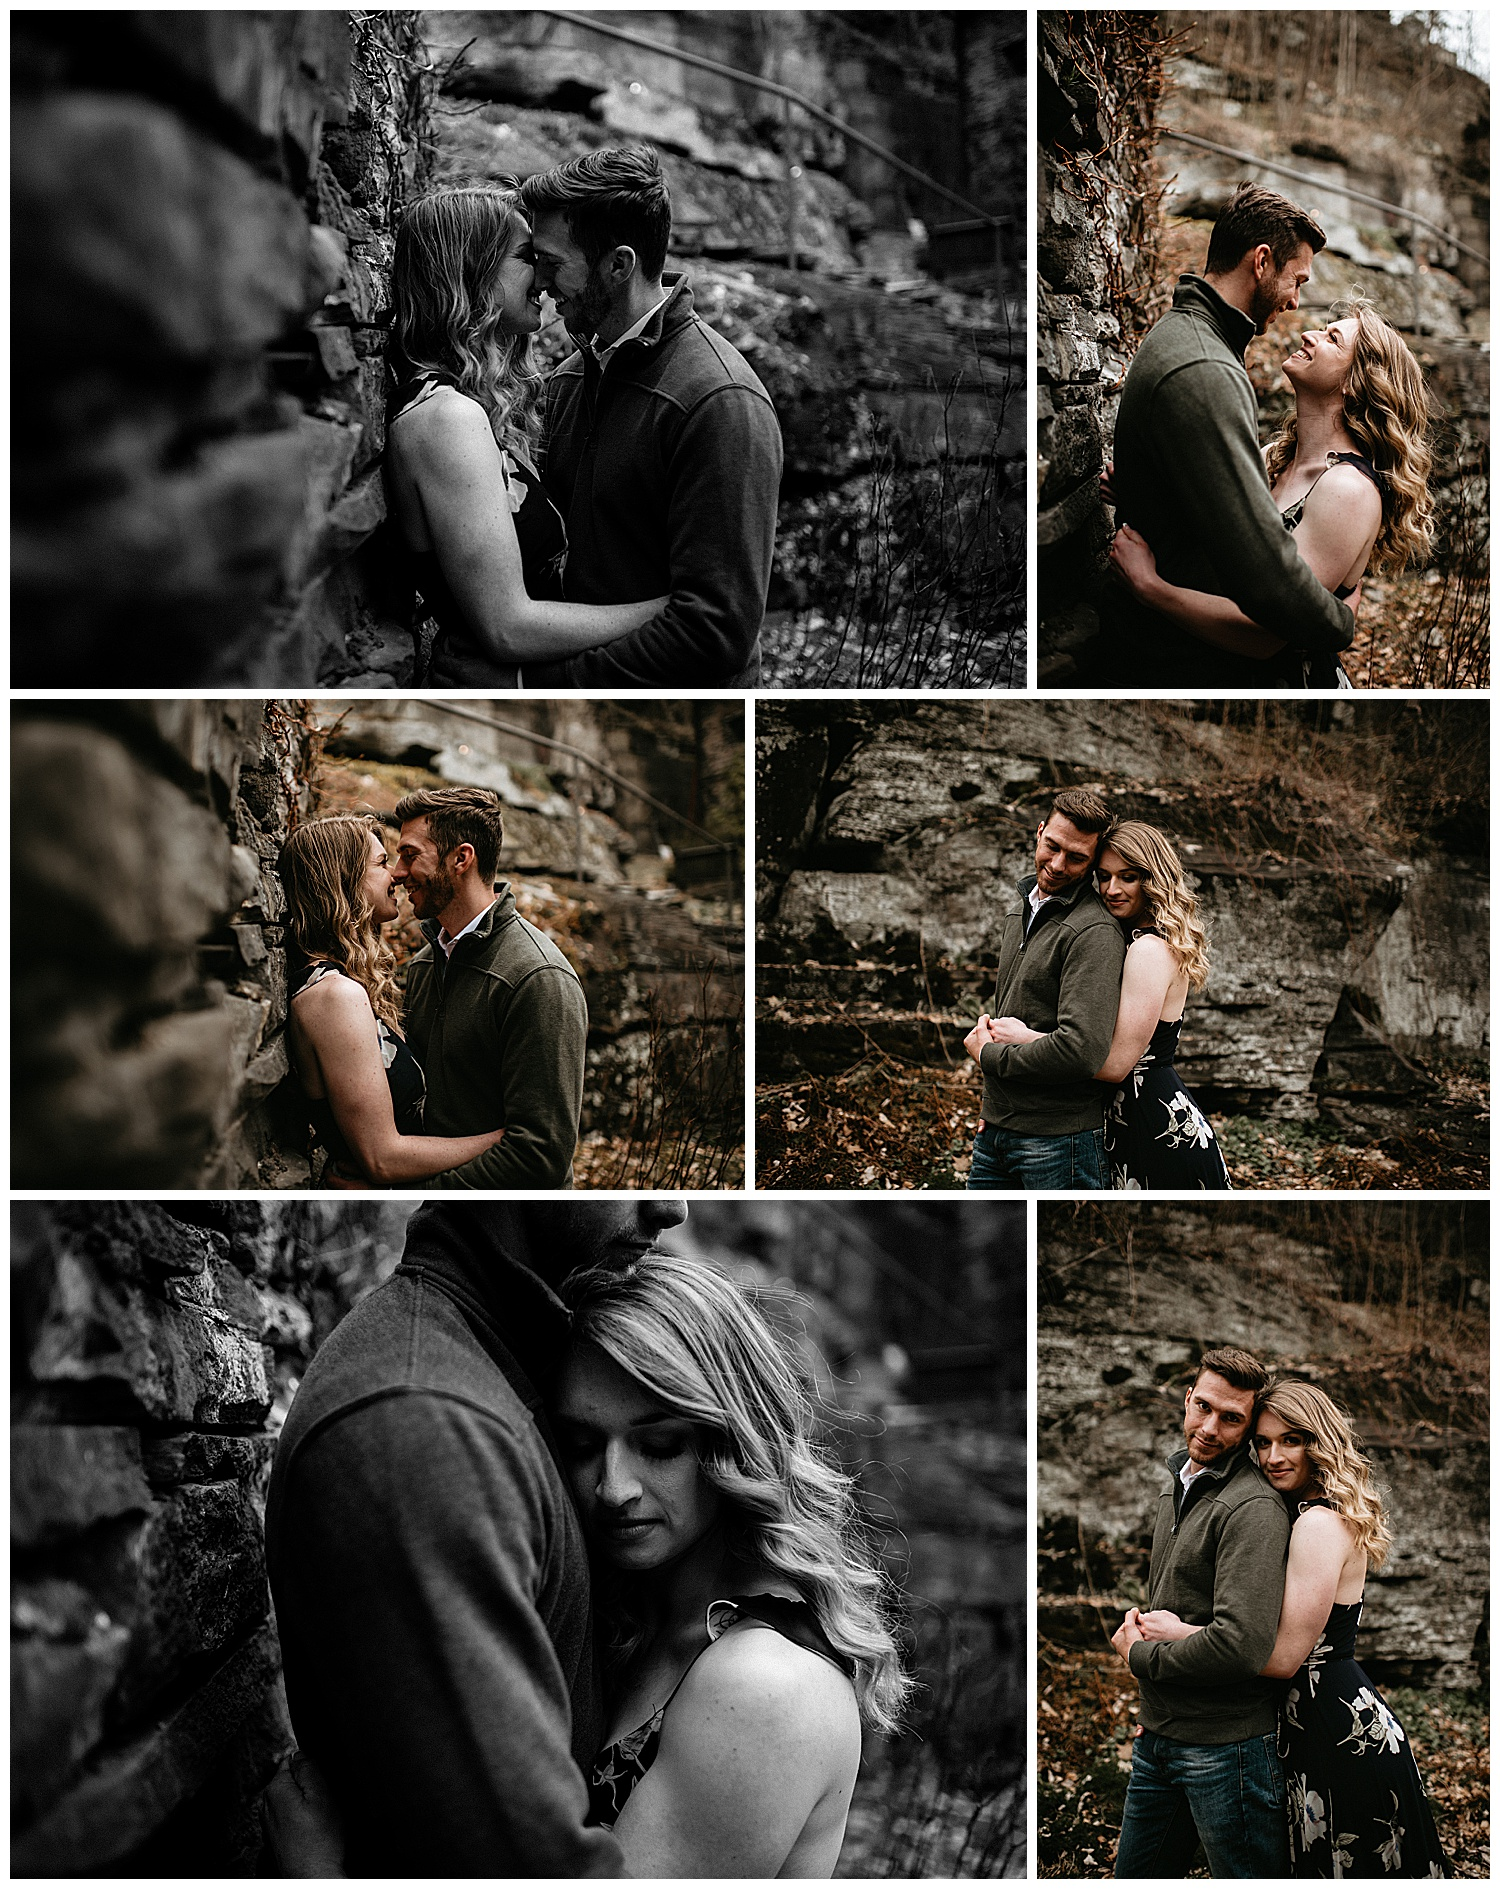 NEPA-Lehigh-Valley-Wedding-Photographer-Ledges-Hotel-Hawley-PA_0021.jpg